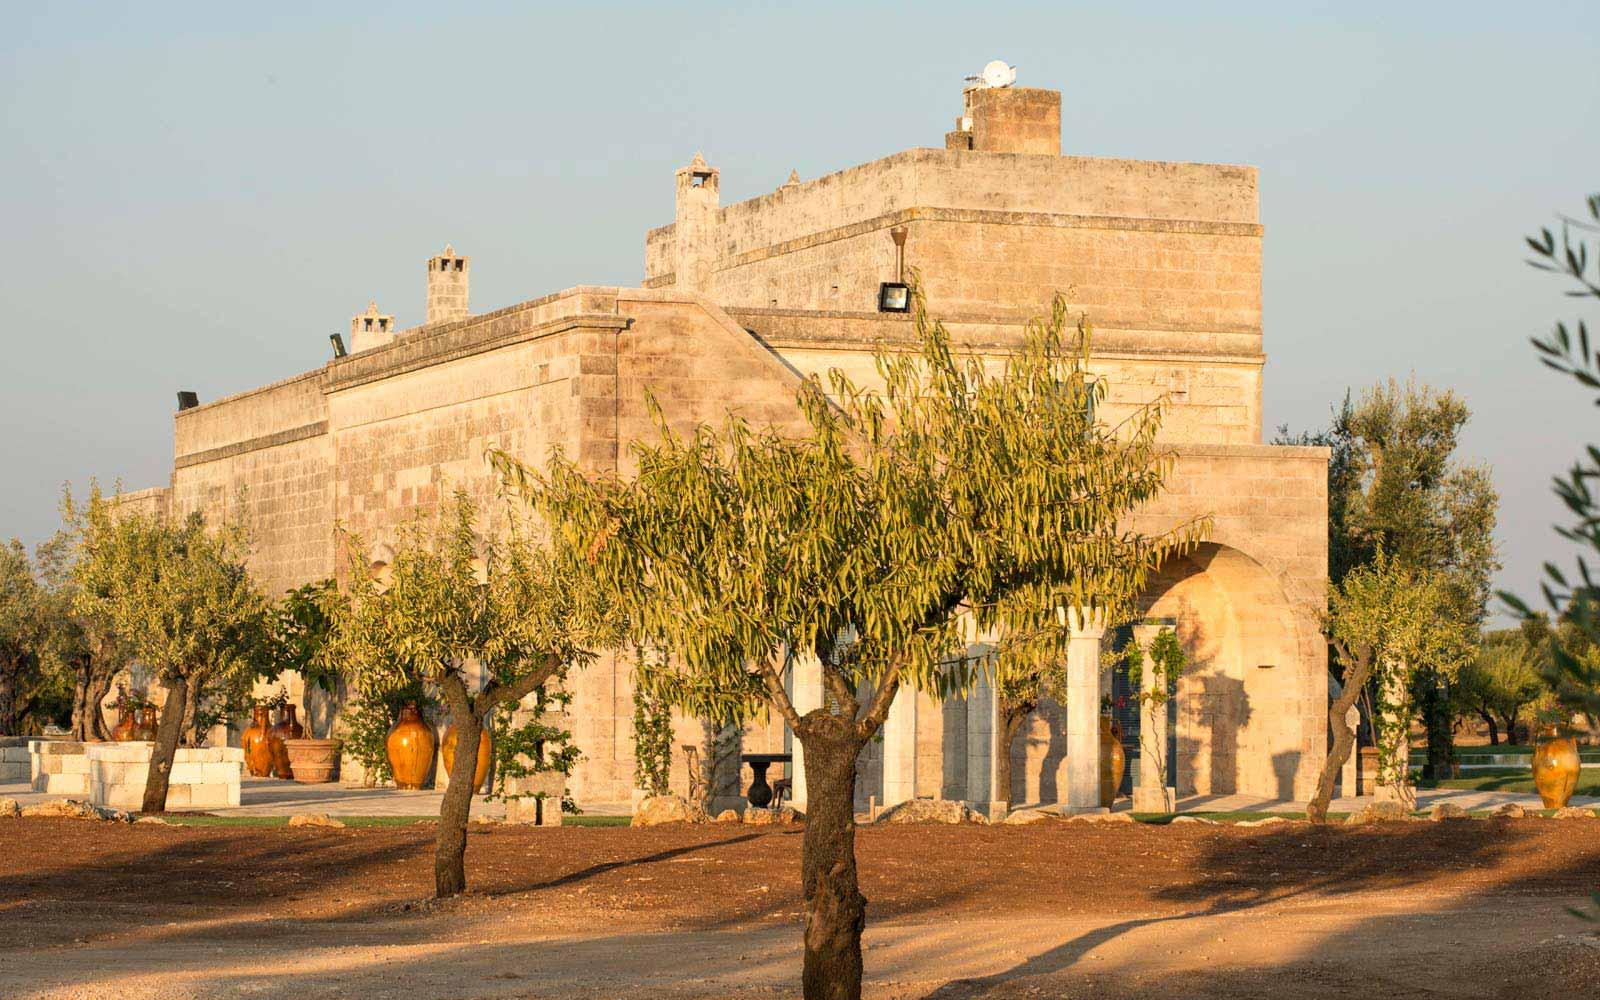 External view of La Residenza of Masseria Pettolecchia